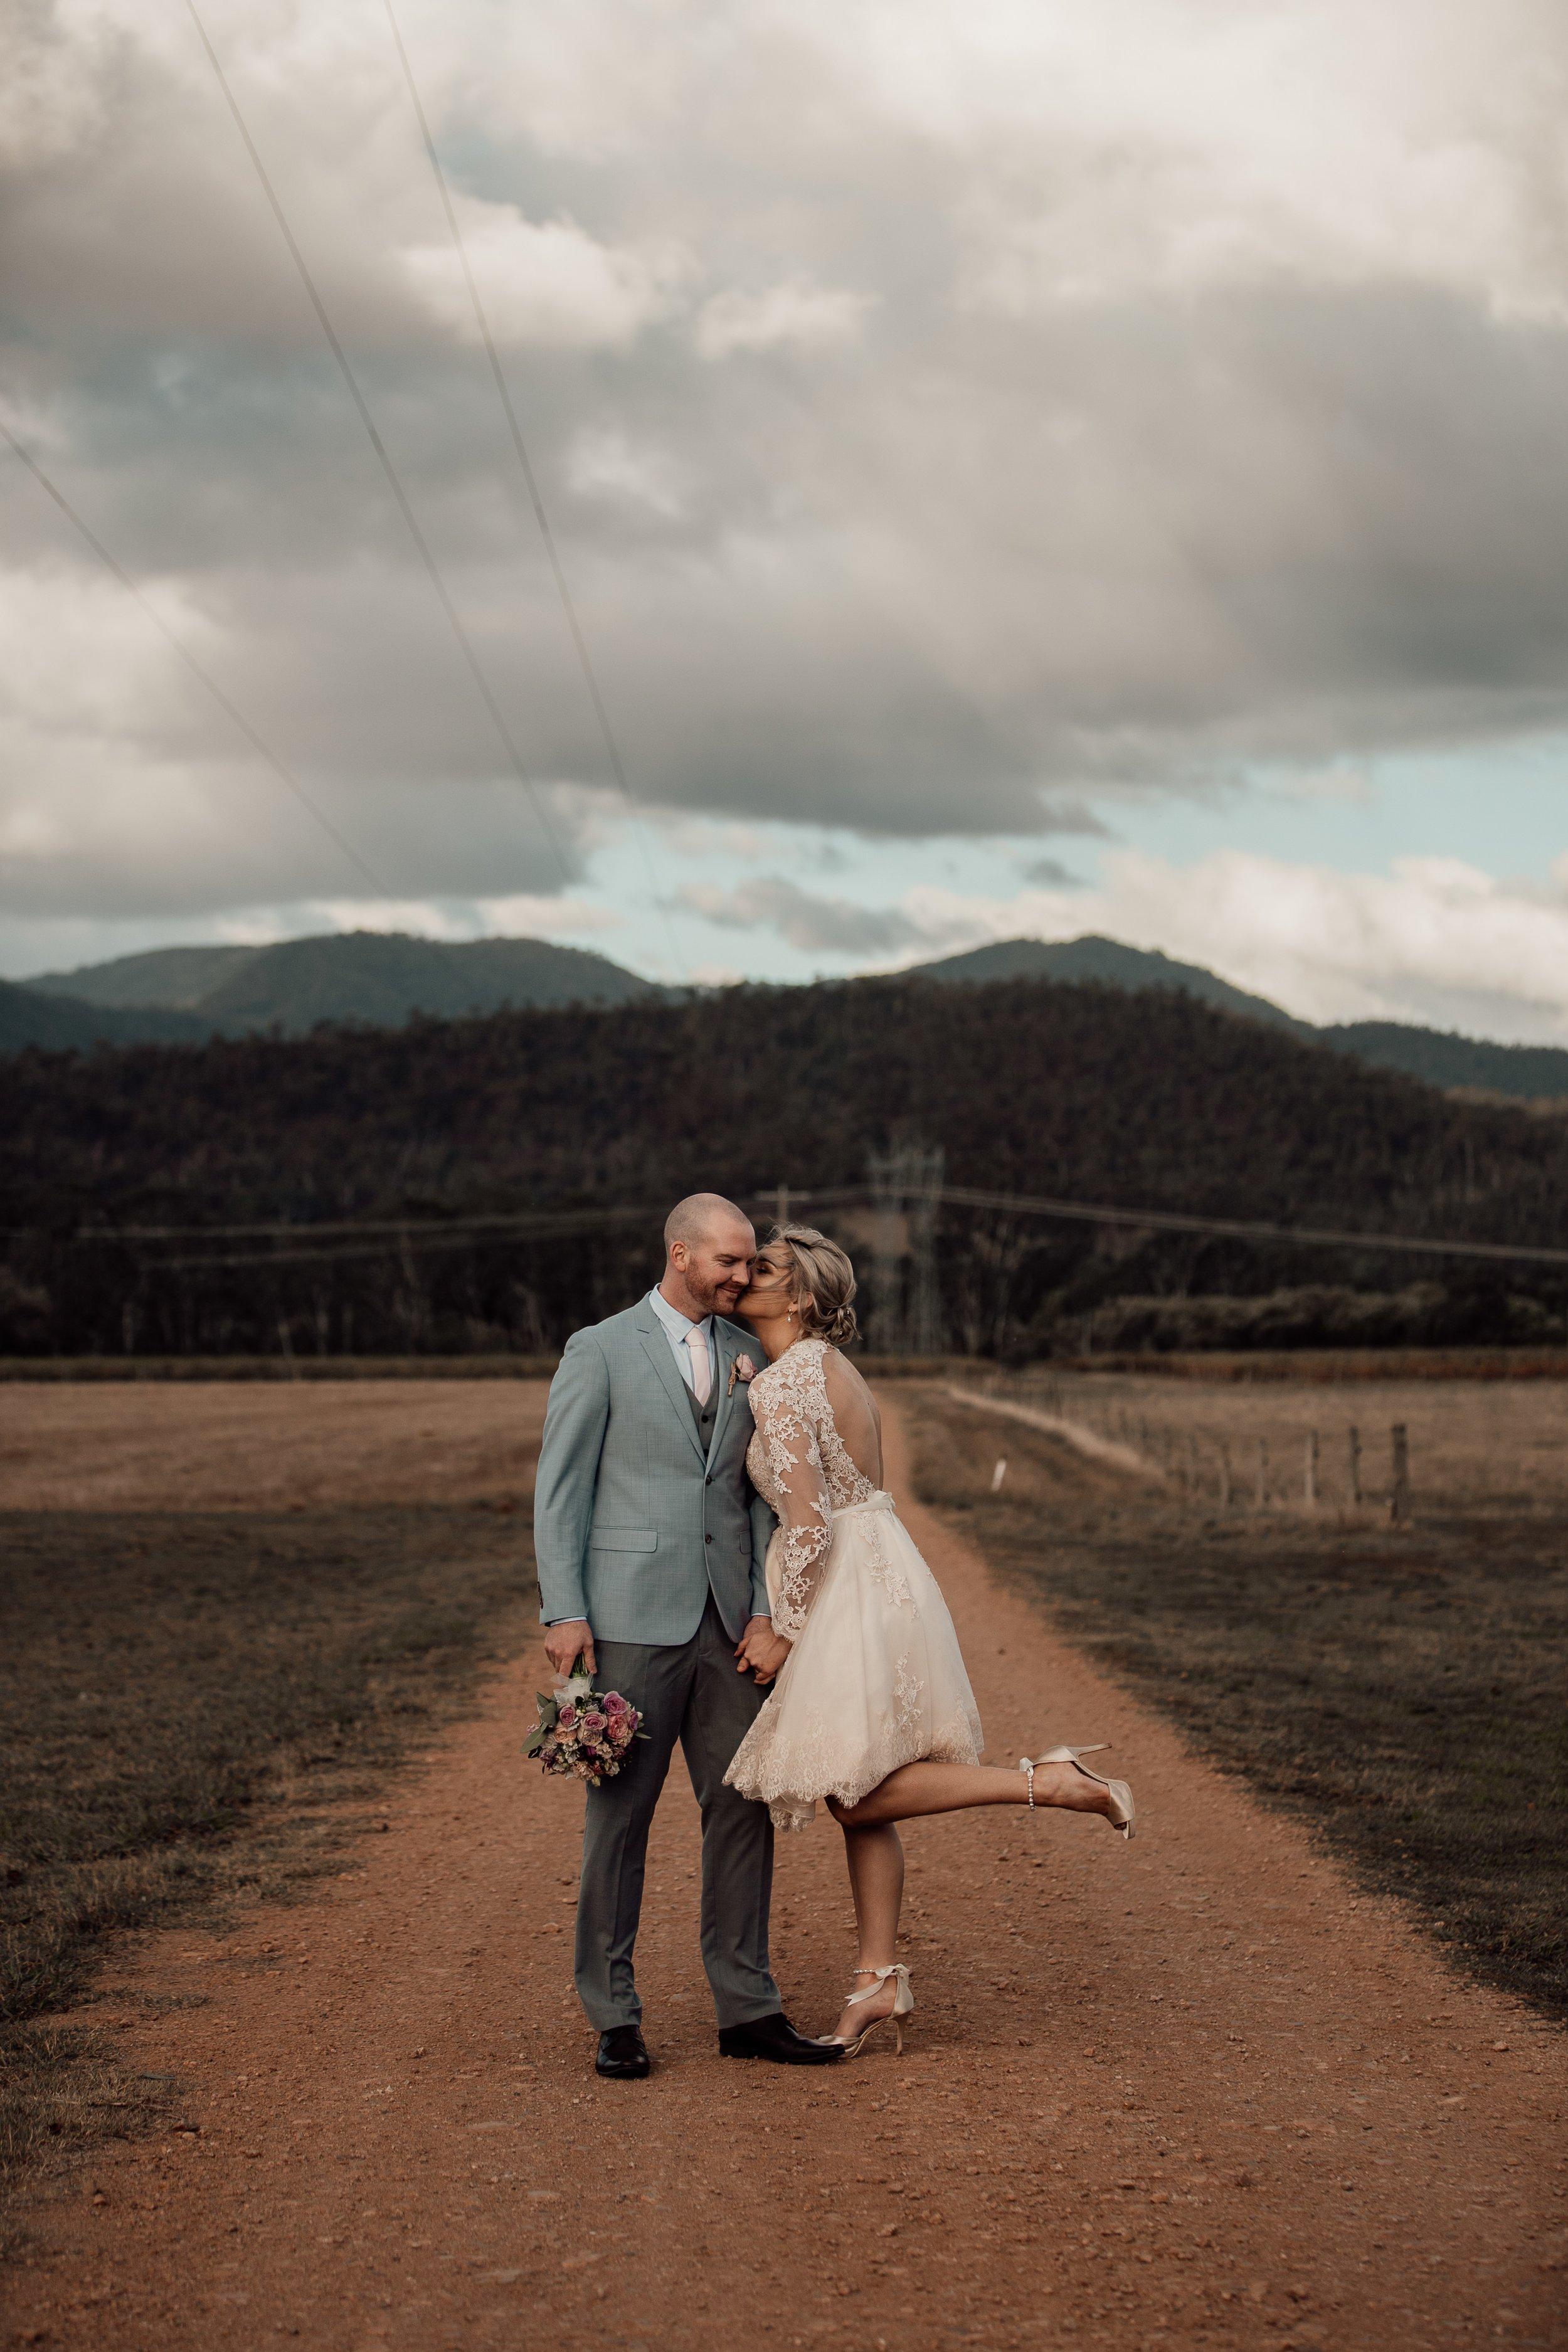 mickalathomas_puremacphotography_weddingphotographer_couplephotographer_Sheppartonphotographer_1485.jpg